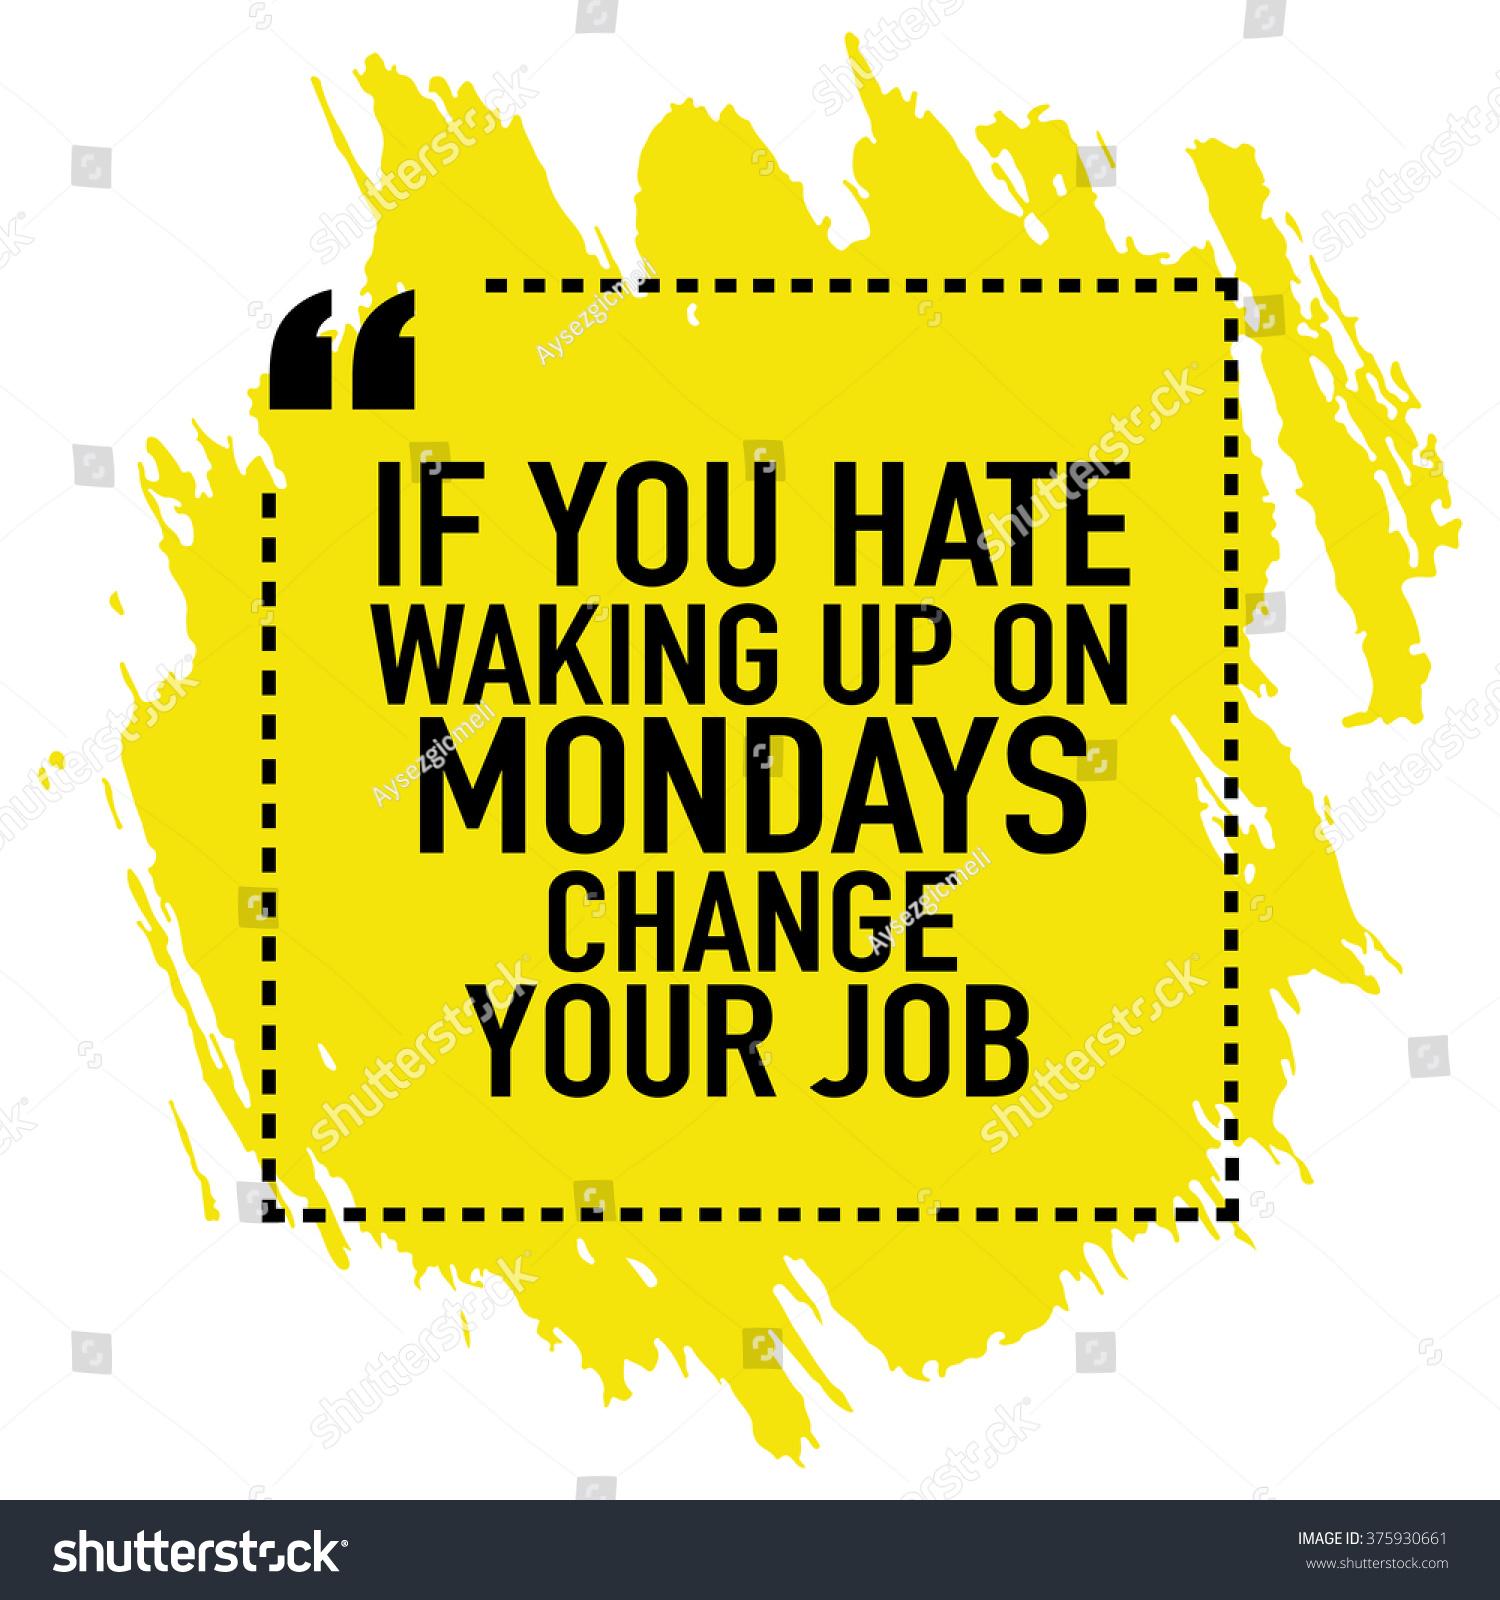 Poster design job description - Motivational Quote Poster Design If You Hate Waking Up On Mondays Change Your Job